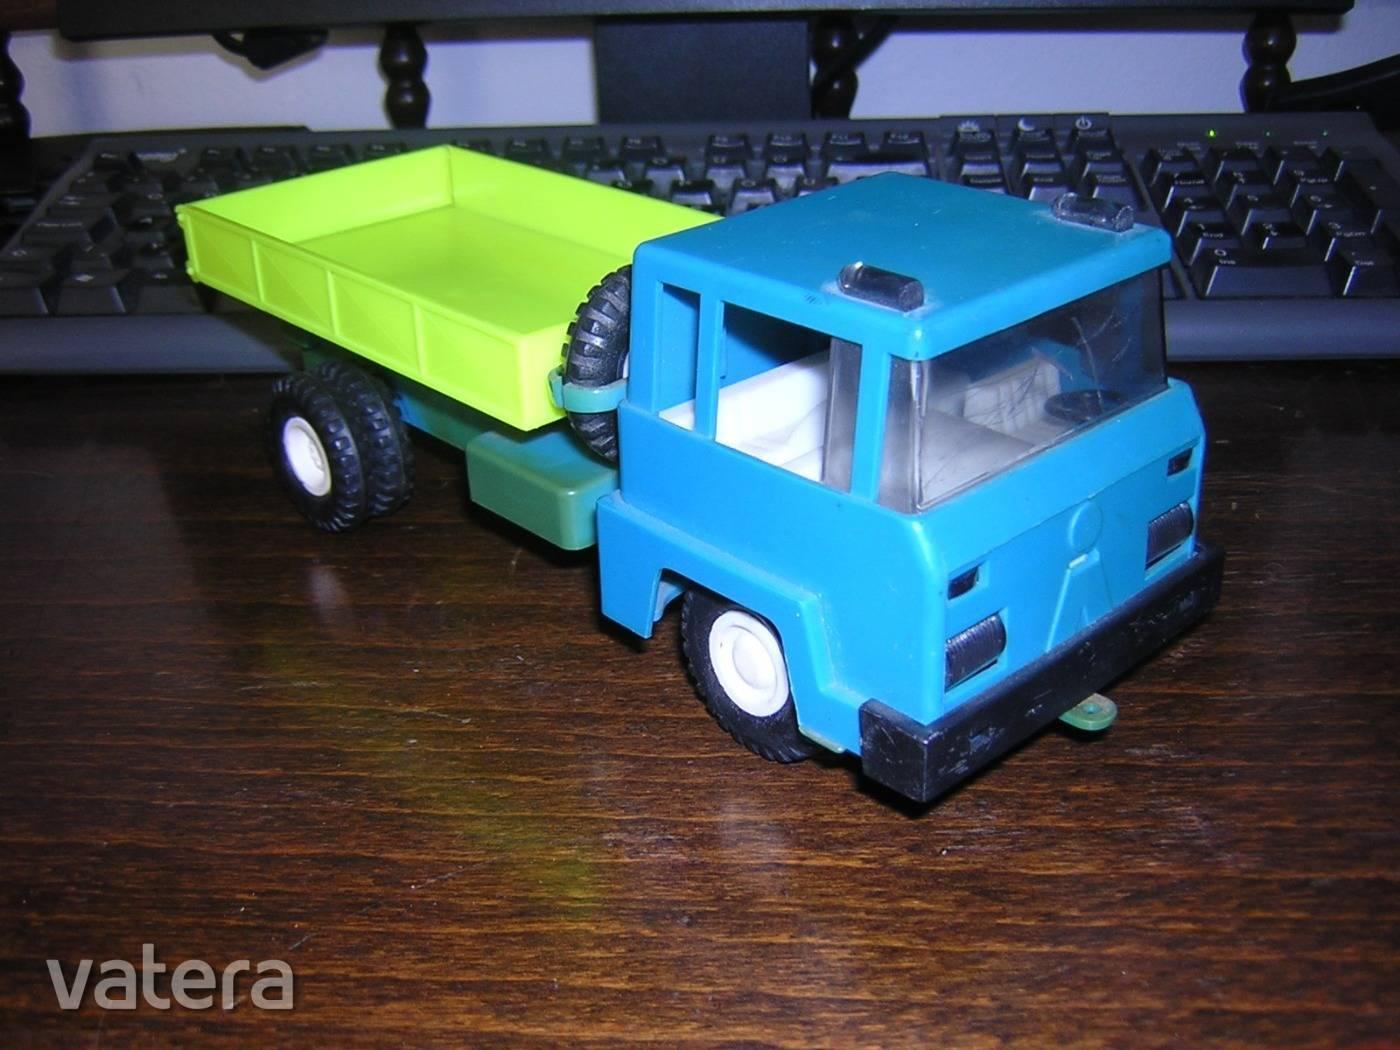 retro-plasticart-billencs-jatekauto-ndk-kisauto-c51b_3_big.jpg